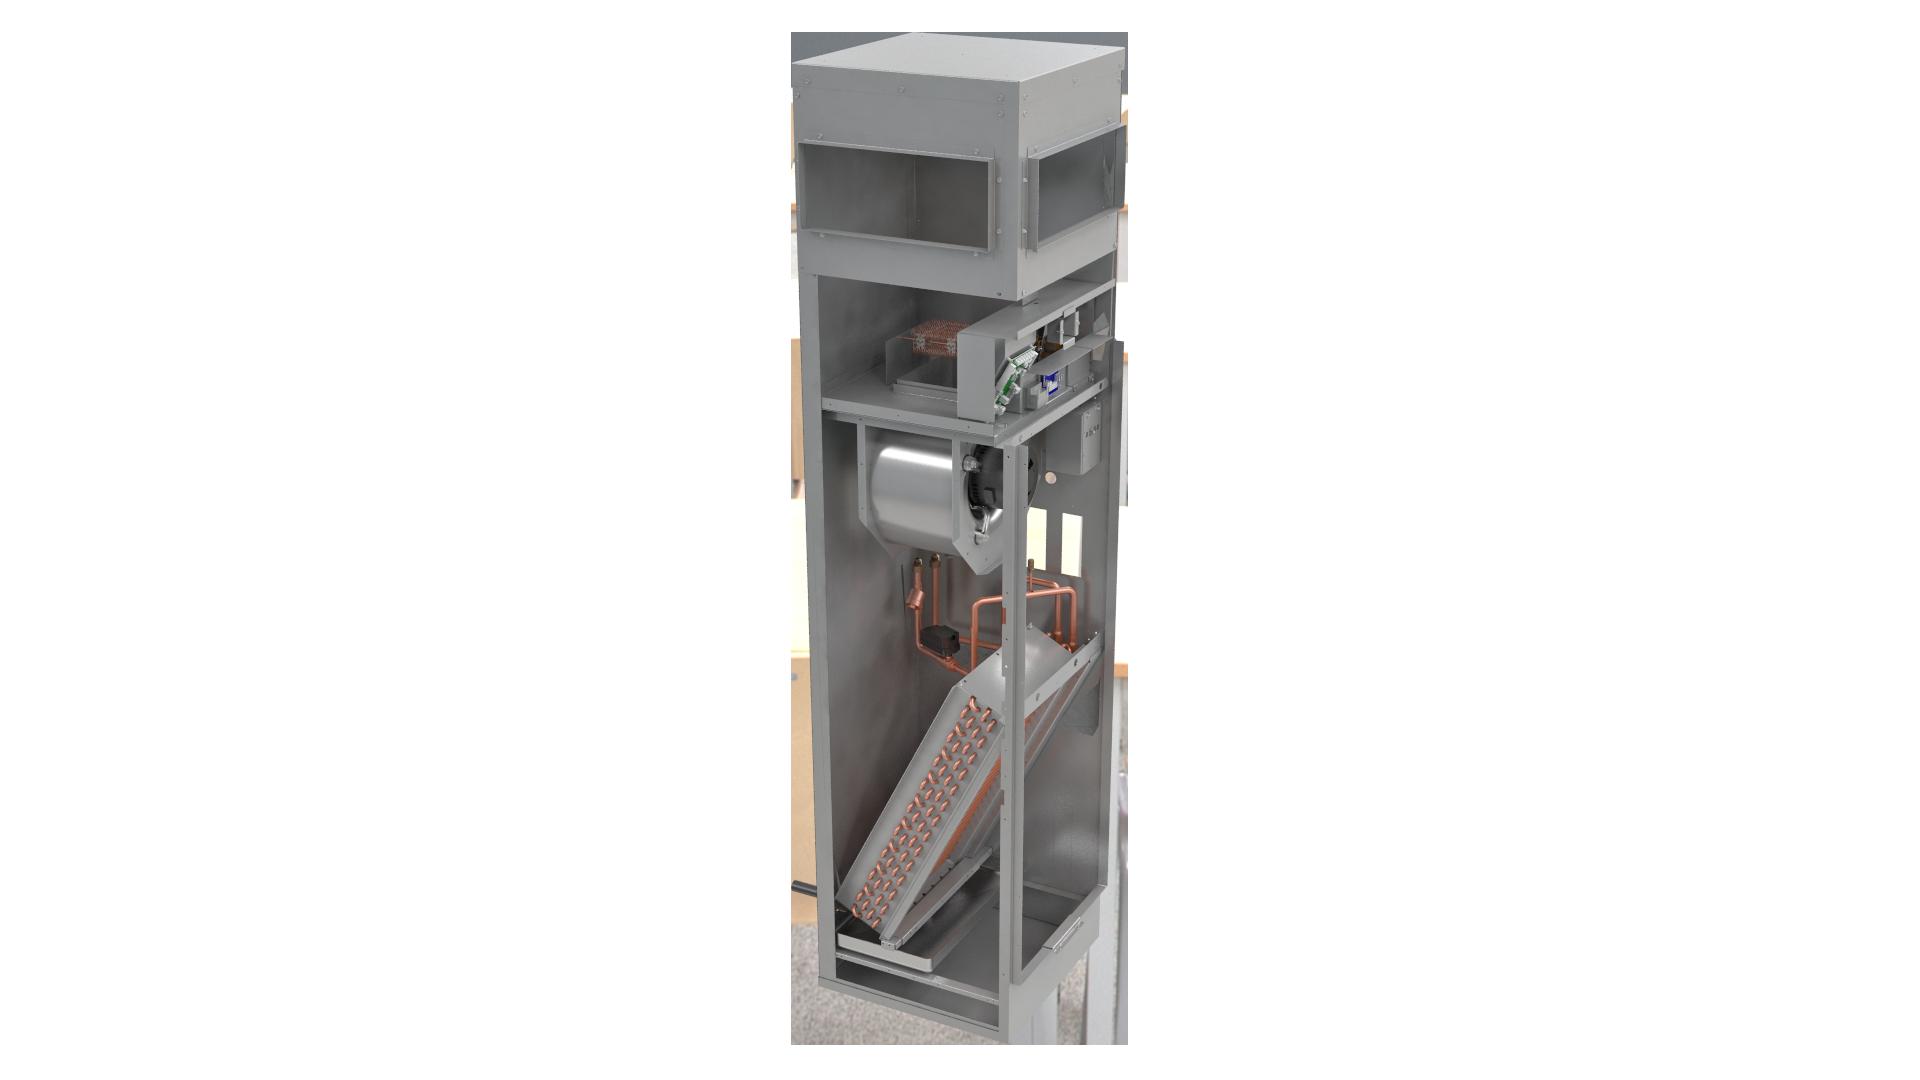 hvac system for high rise building pdf